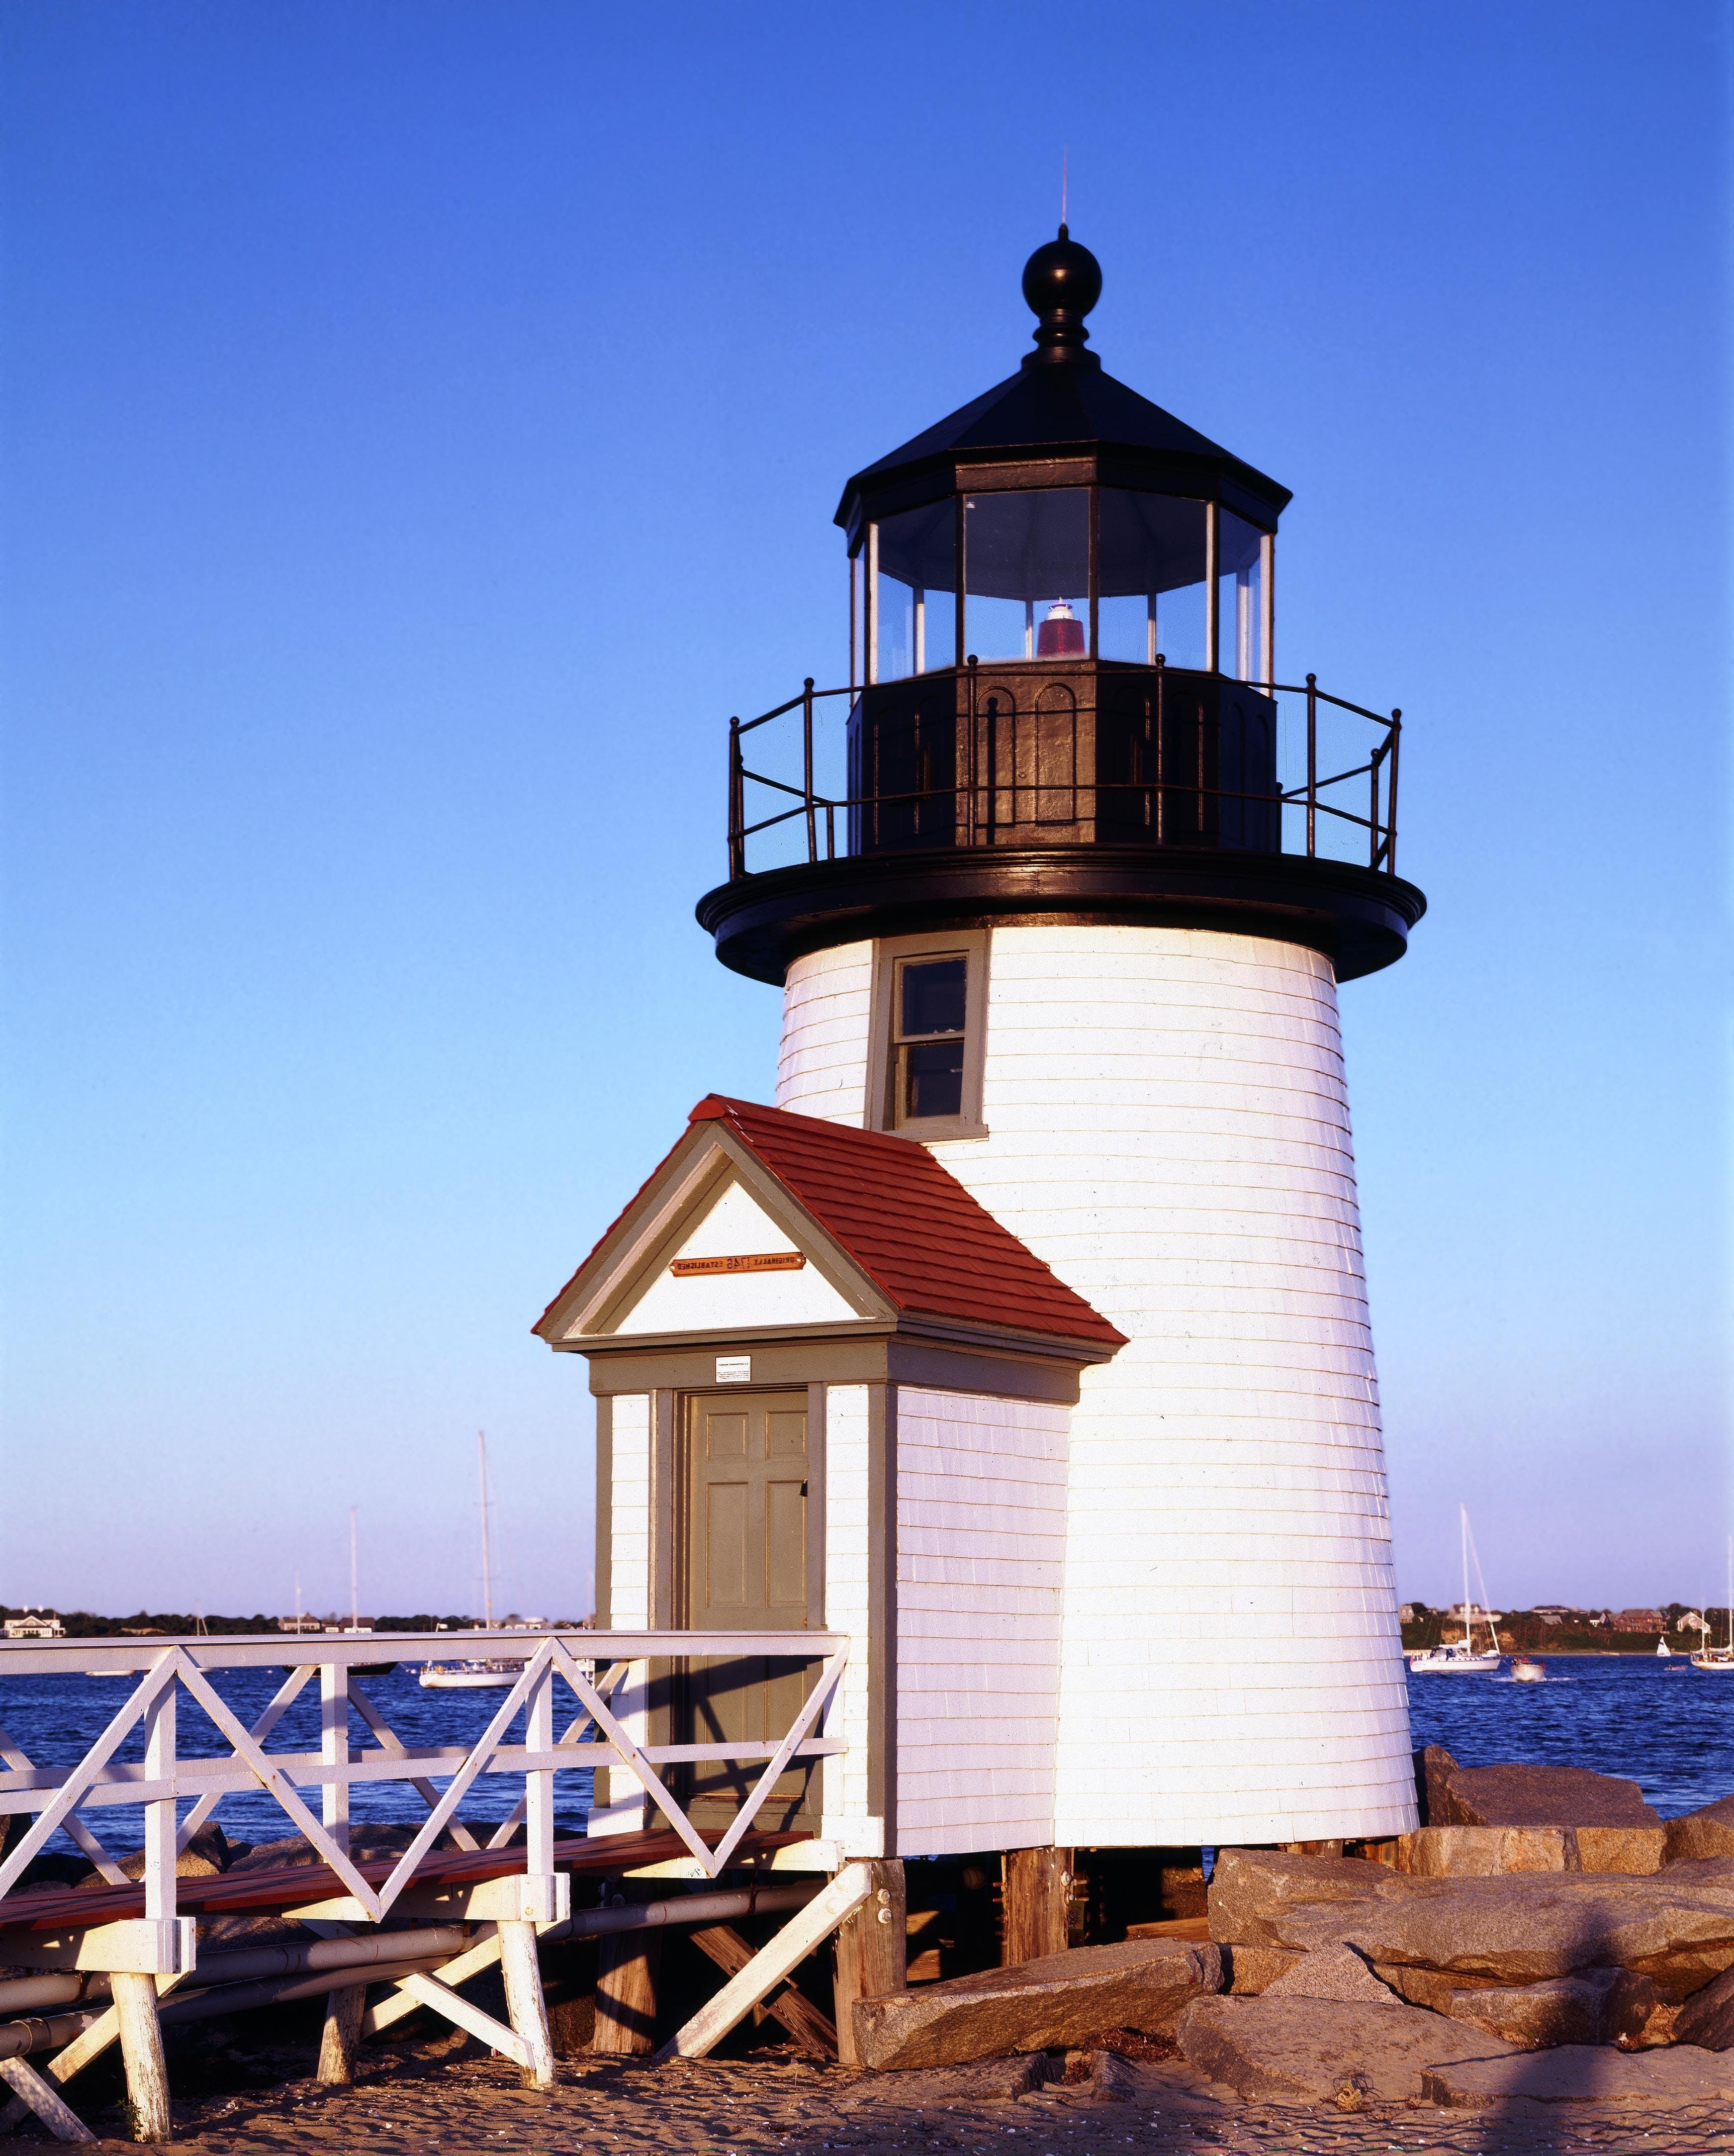 White and Black Lighthouse Near Sea